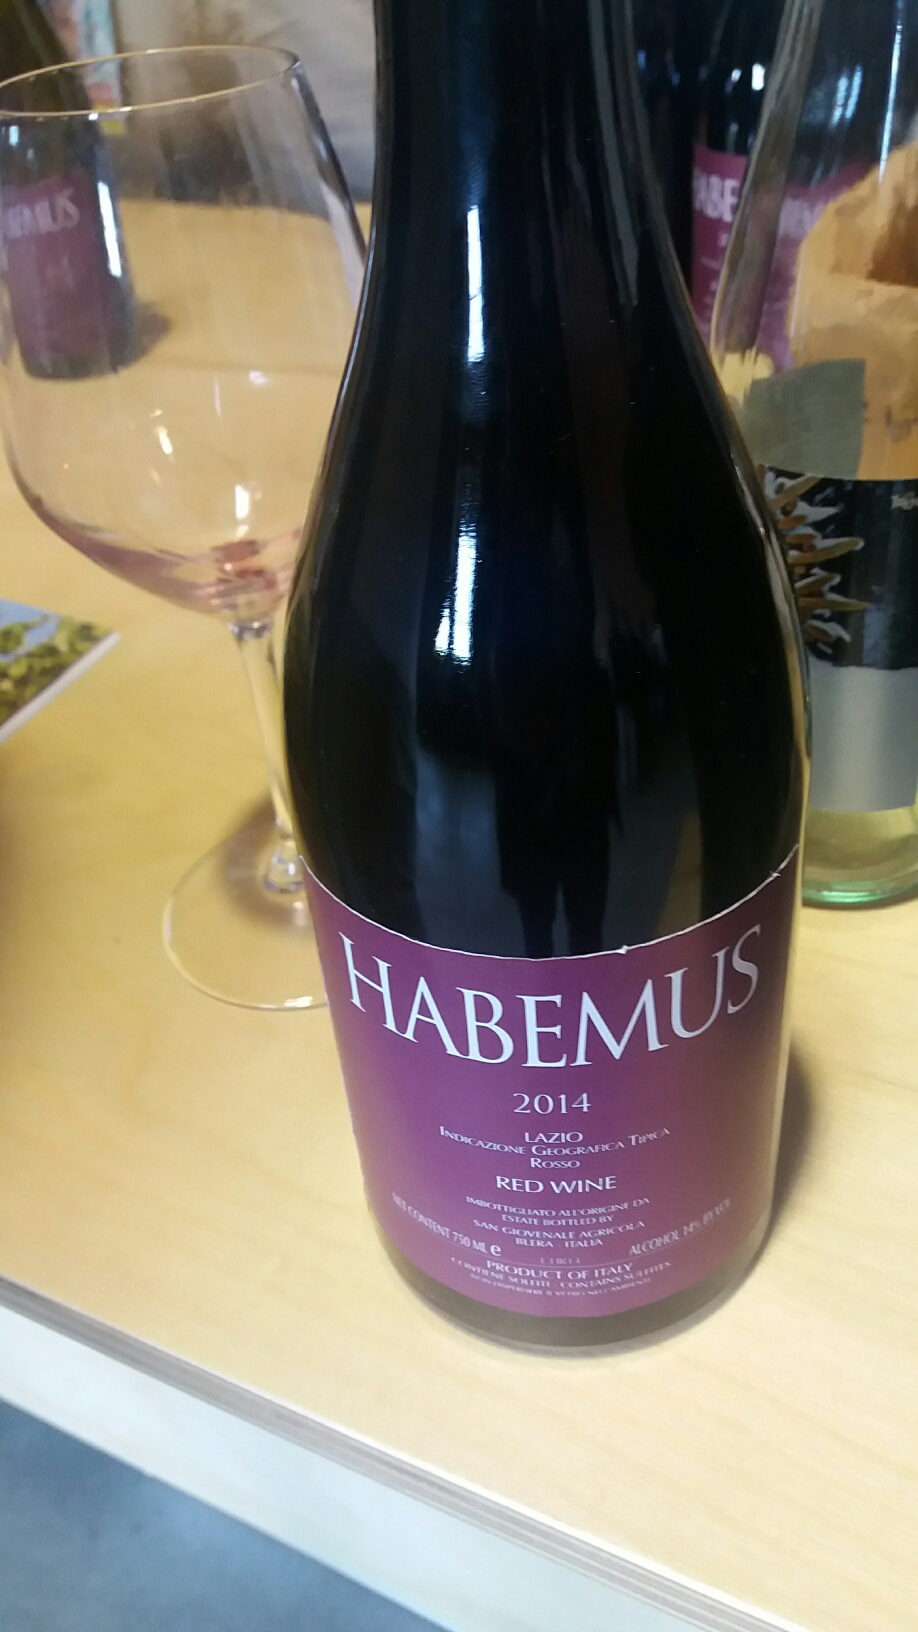 San Giovenale - Habemus etichetta rossa